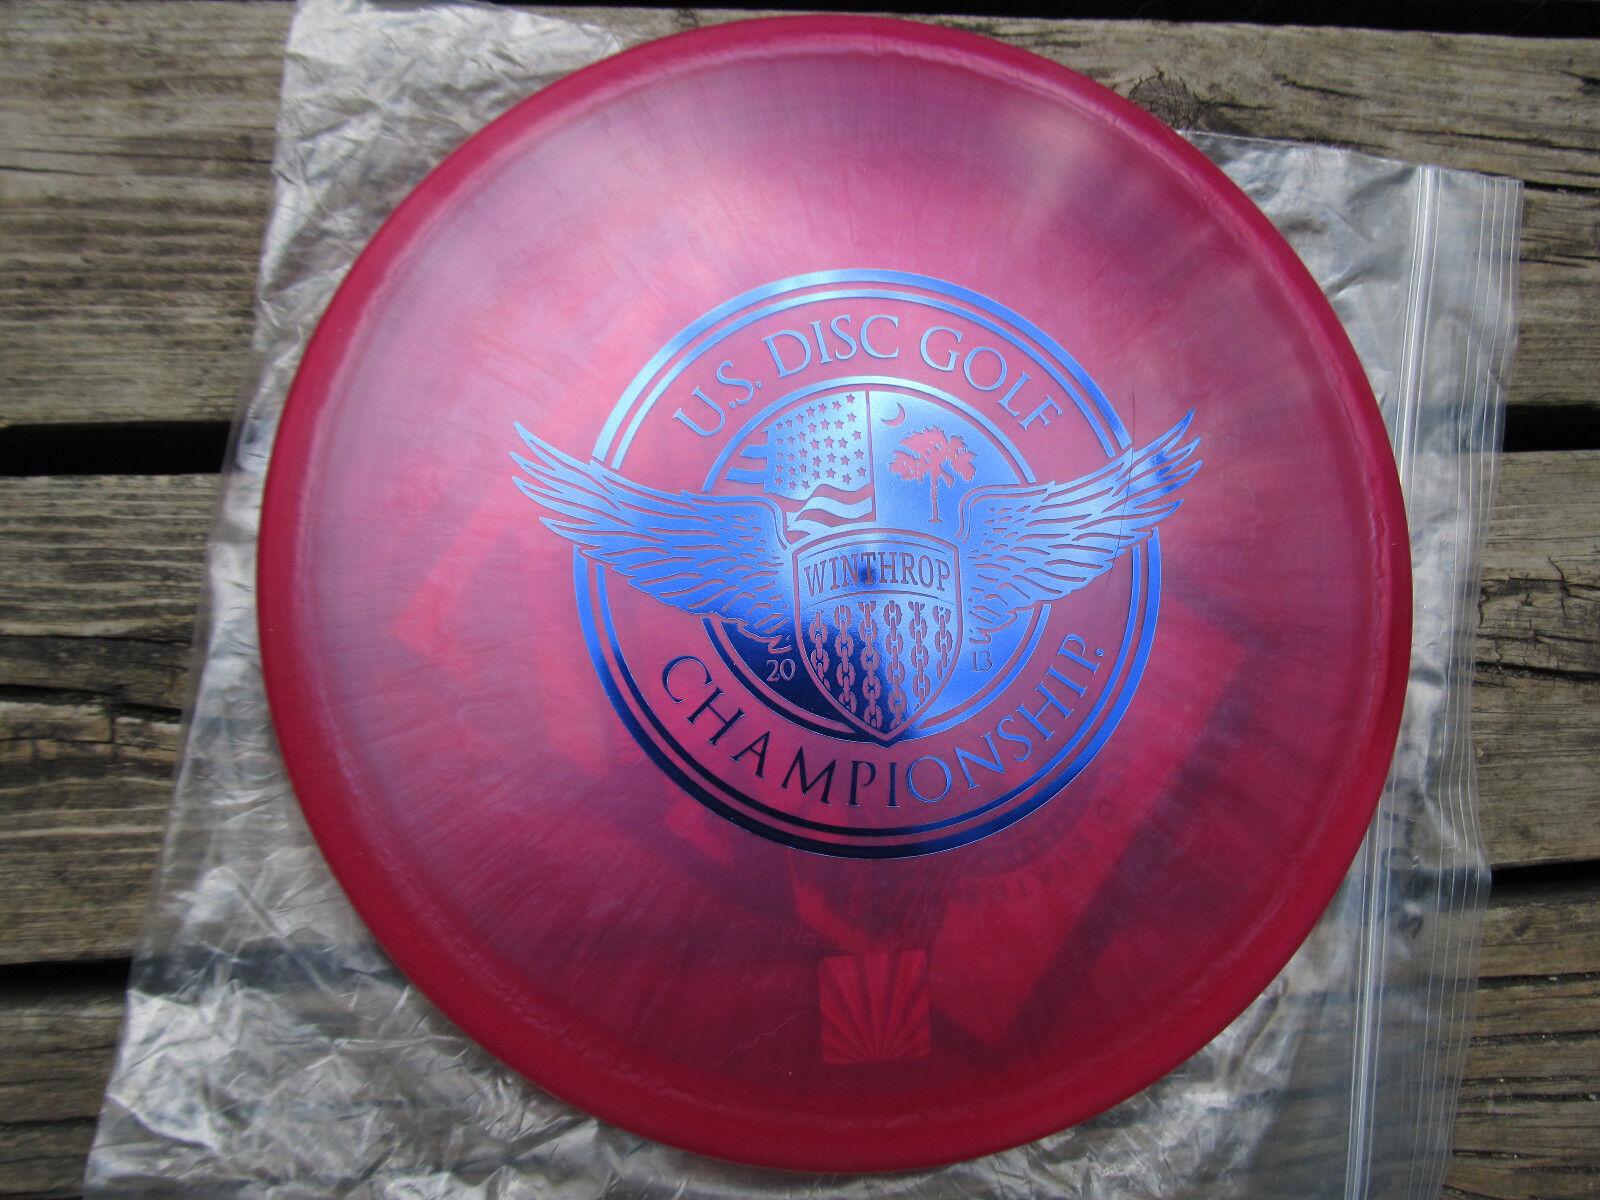 USDGC Champion Original Rancho Pearl Merlot Dark huk Blau Metallic Free Spirit huk Dark 774618